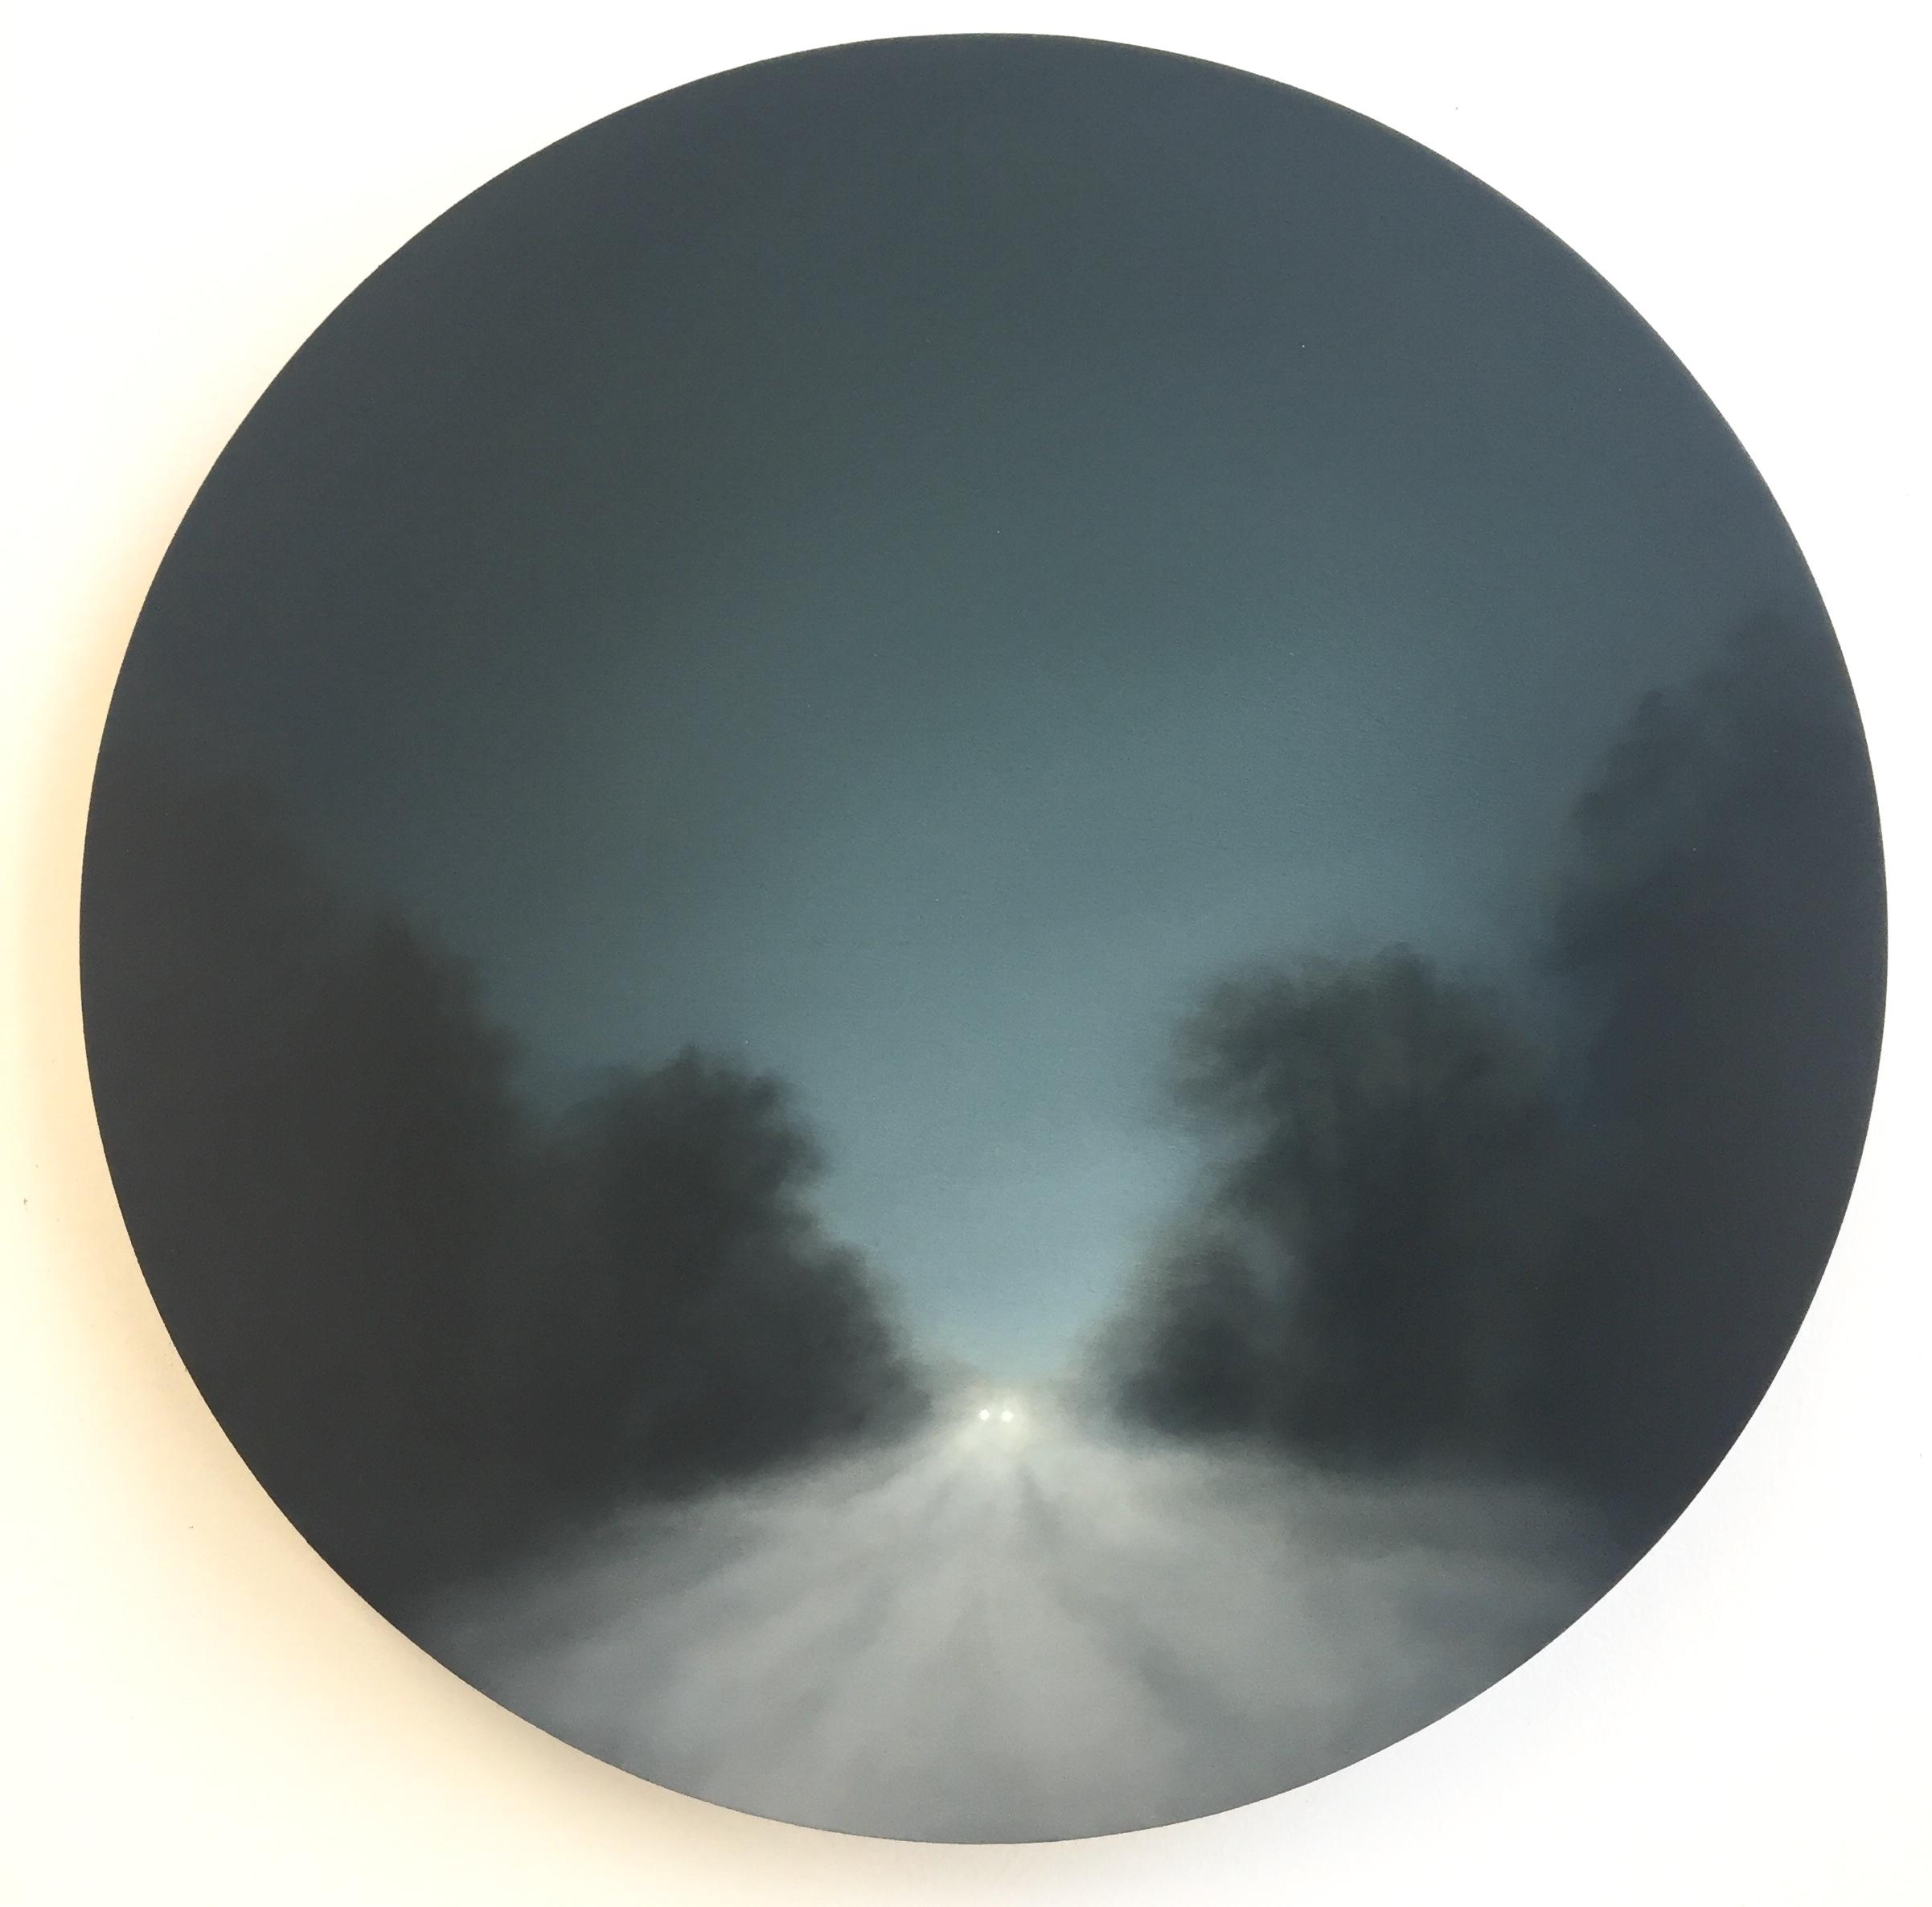 Gill Rocca (b. 1971),  Figment XXVII, Oil on birch ply, 30 cm diameter.